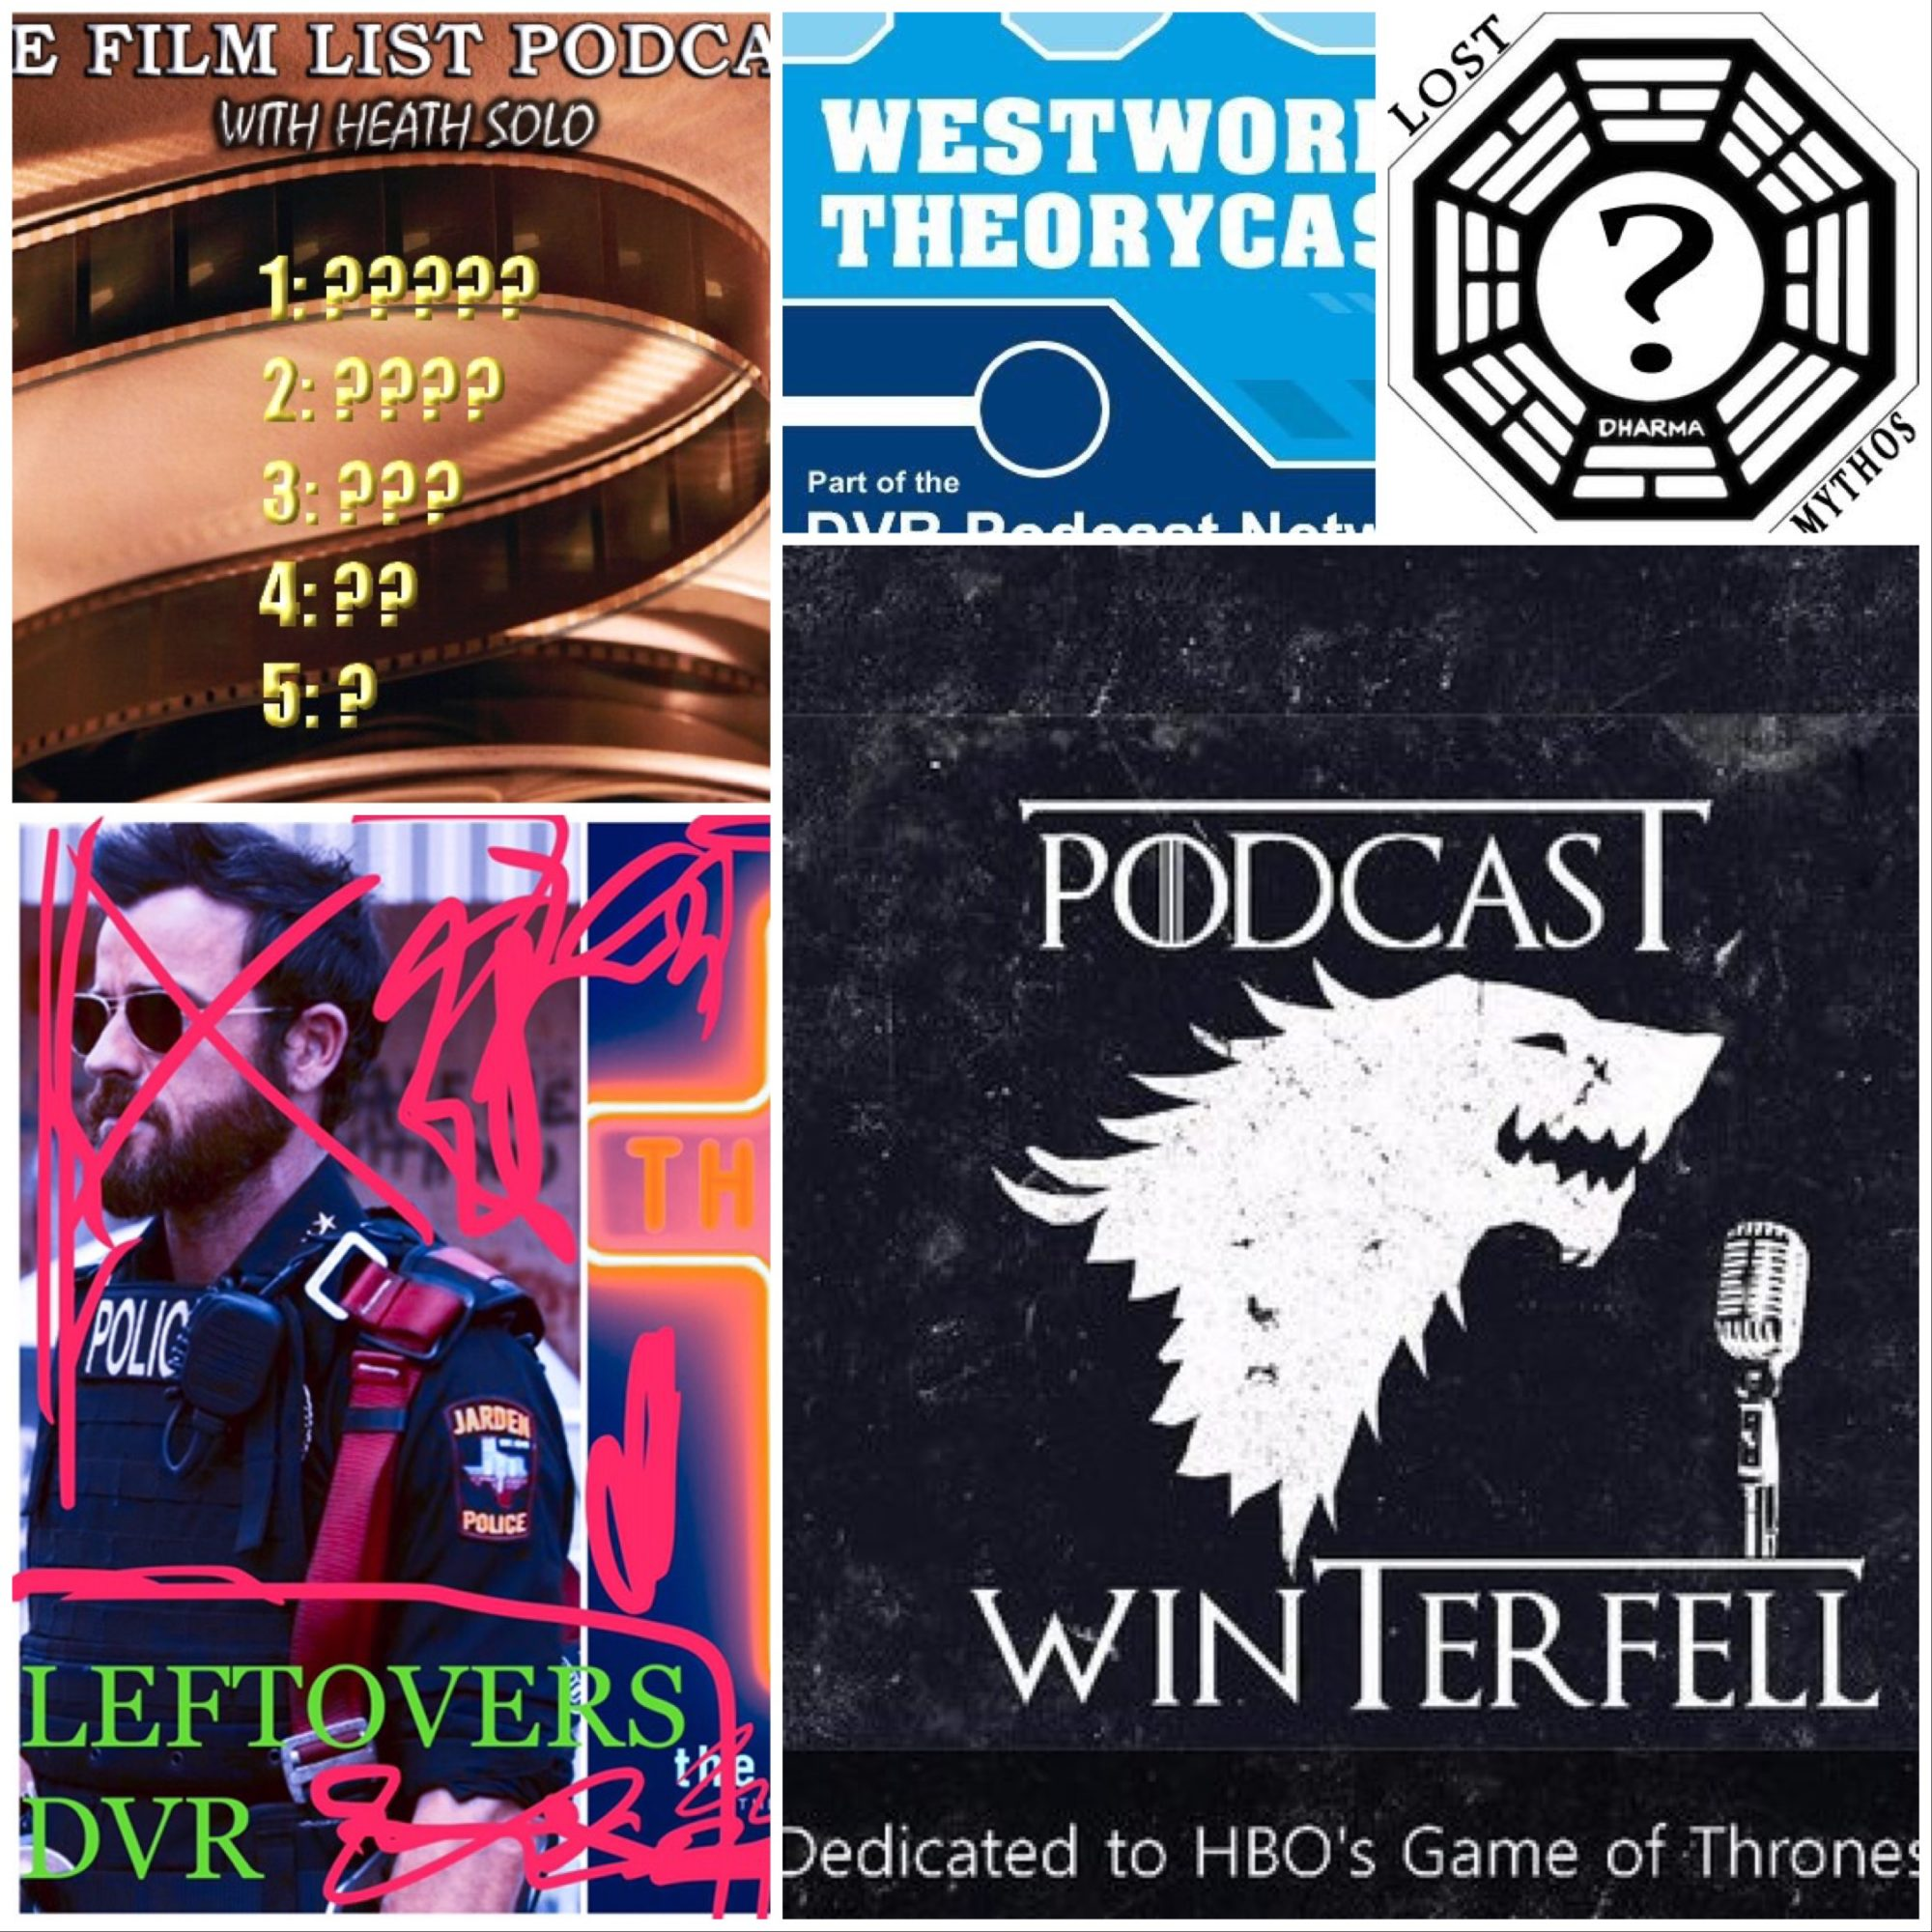 DVR Podcast Network